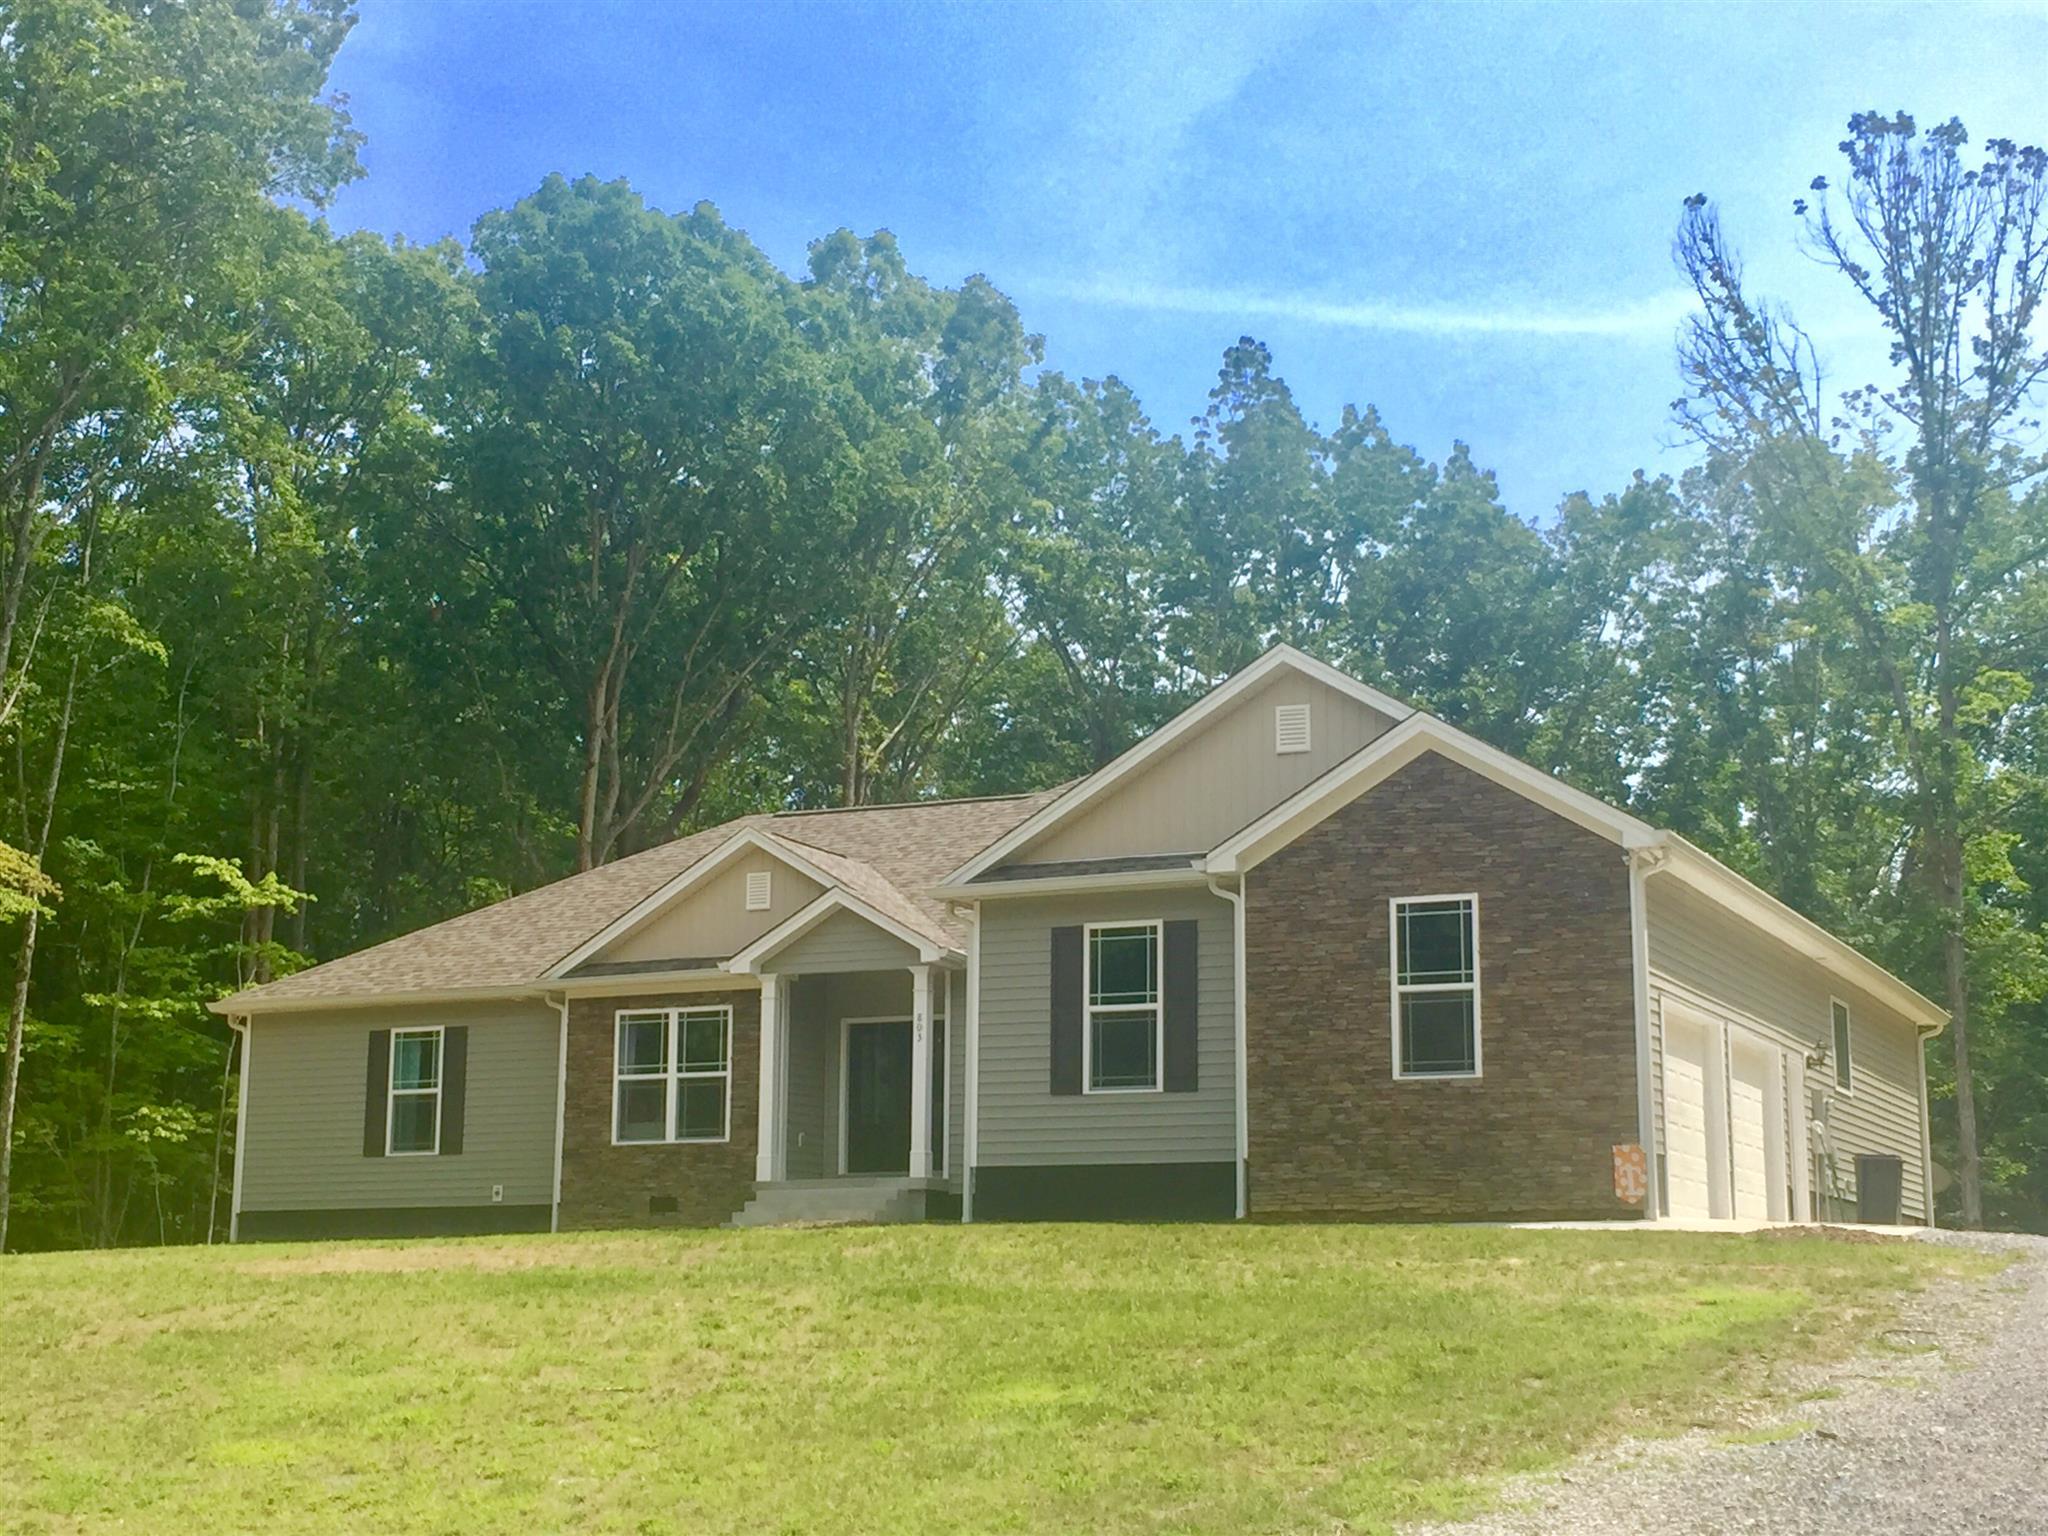 803 Mtn Shadows Dr, Monteagle, TN 37356 - Monteagle, TN real estate listing